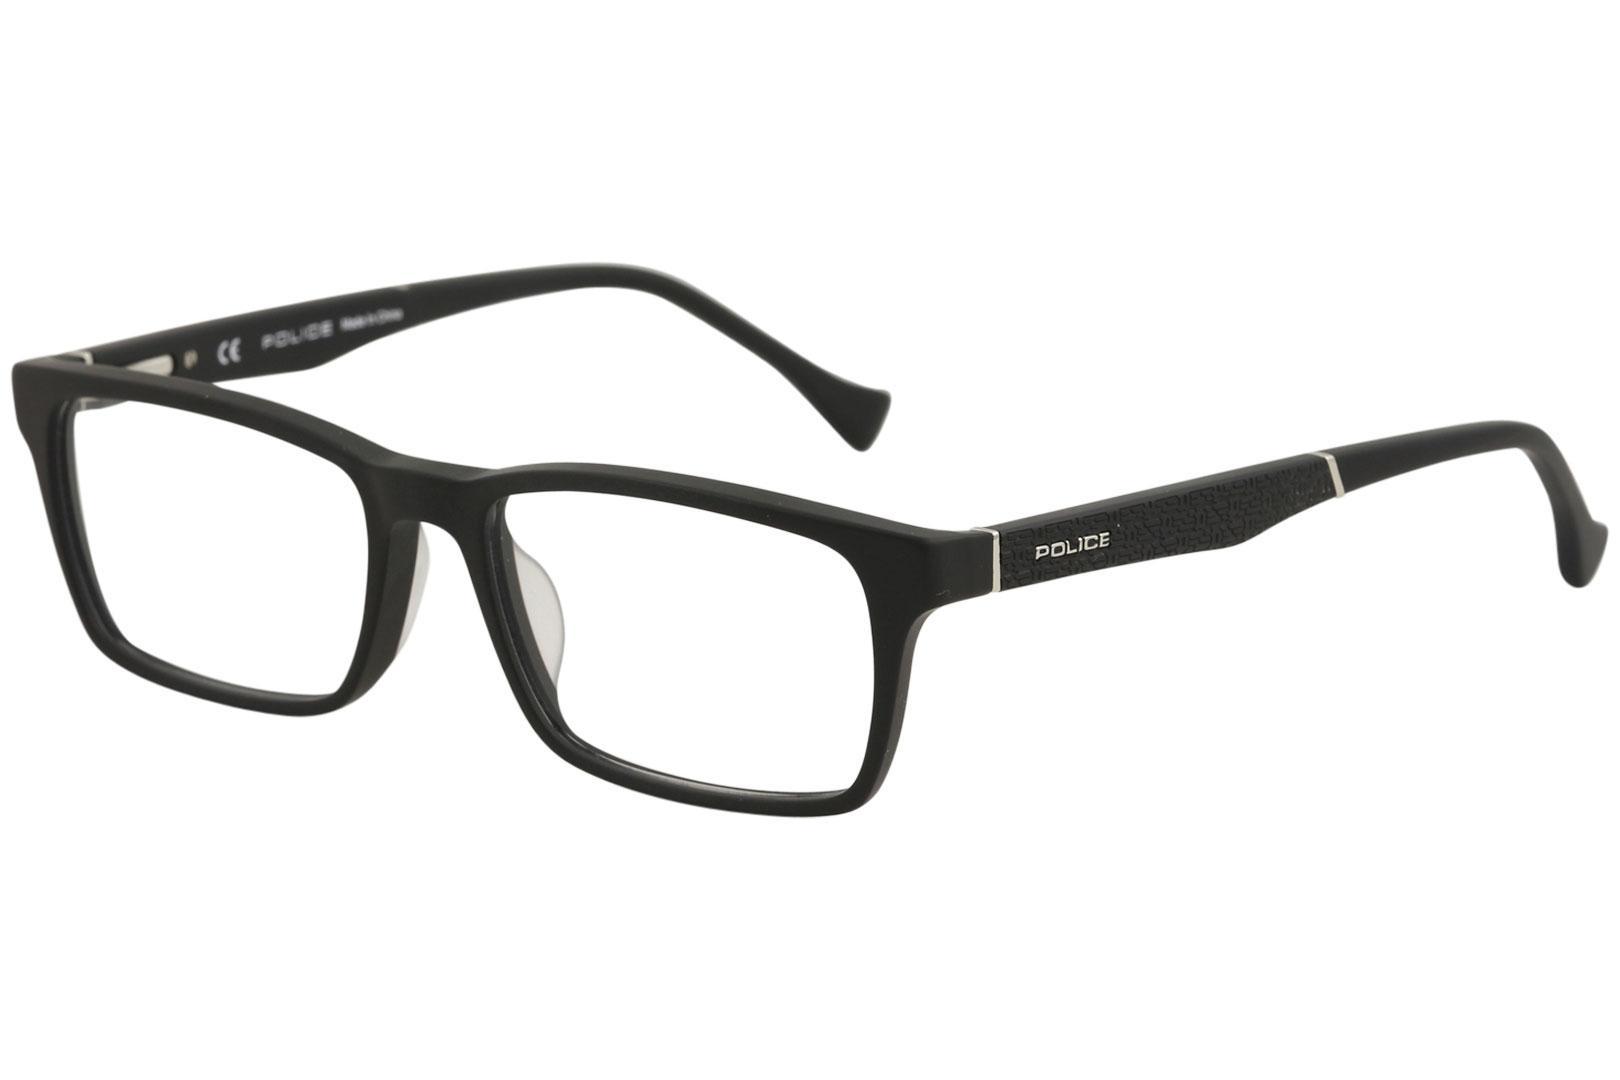 cc65dbd5fb08 Police Men's Eyeglasses Close Up 5 VPL055 VPL/055 Full Rim Optical Frame by  Police